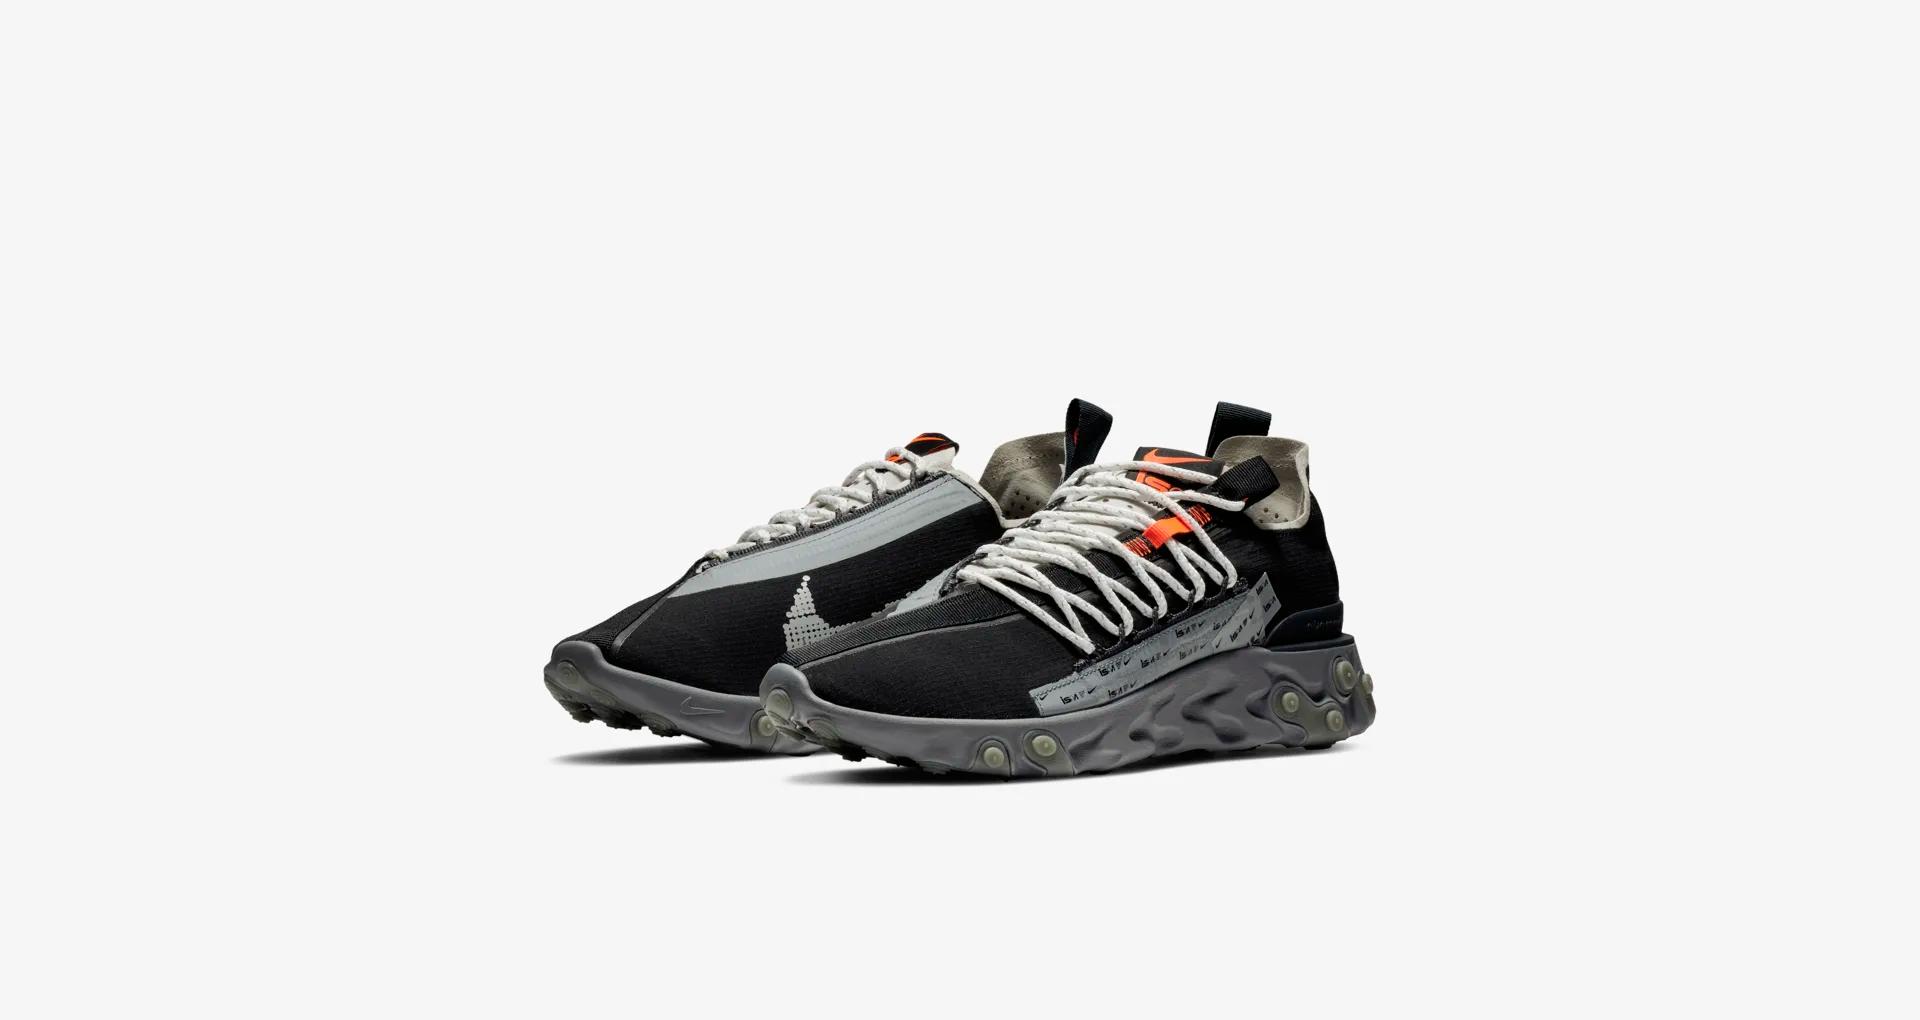 Nike React Runner WR ISPA Black 6